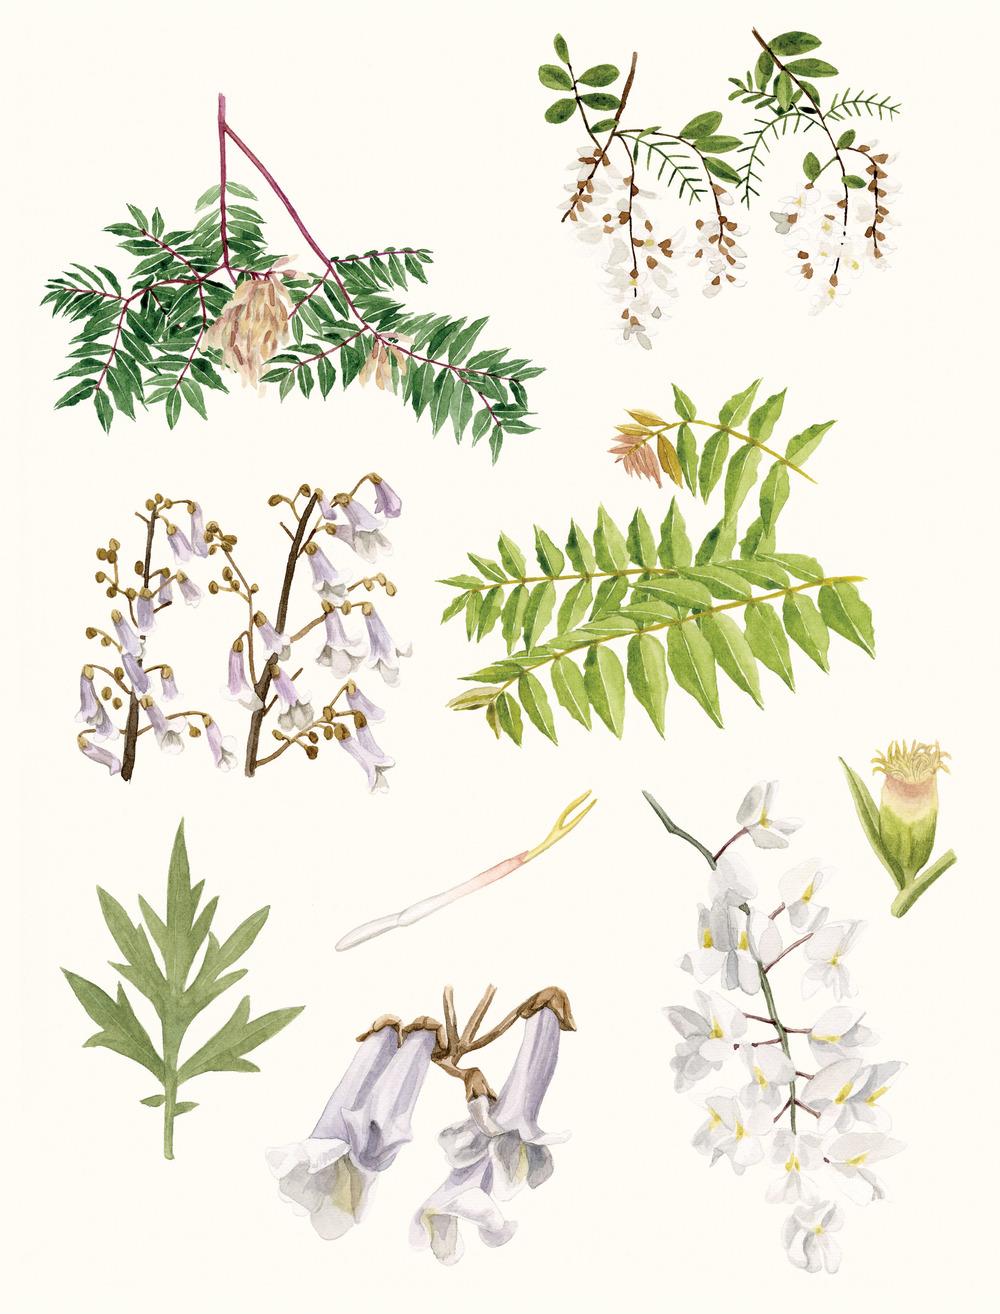 2-plants.jpg